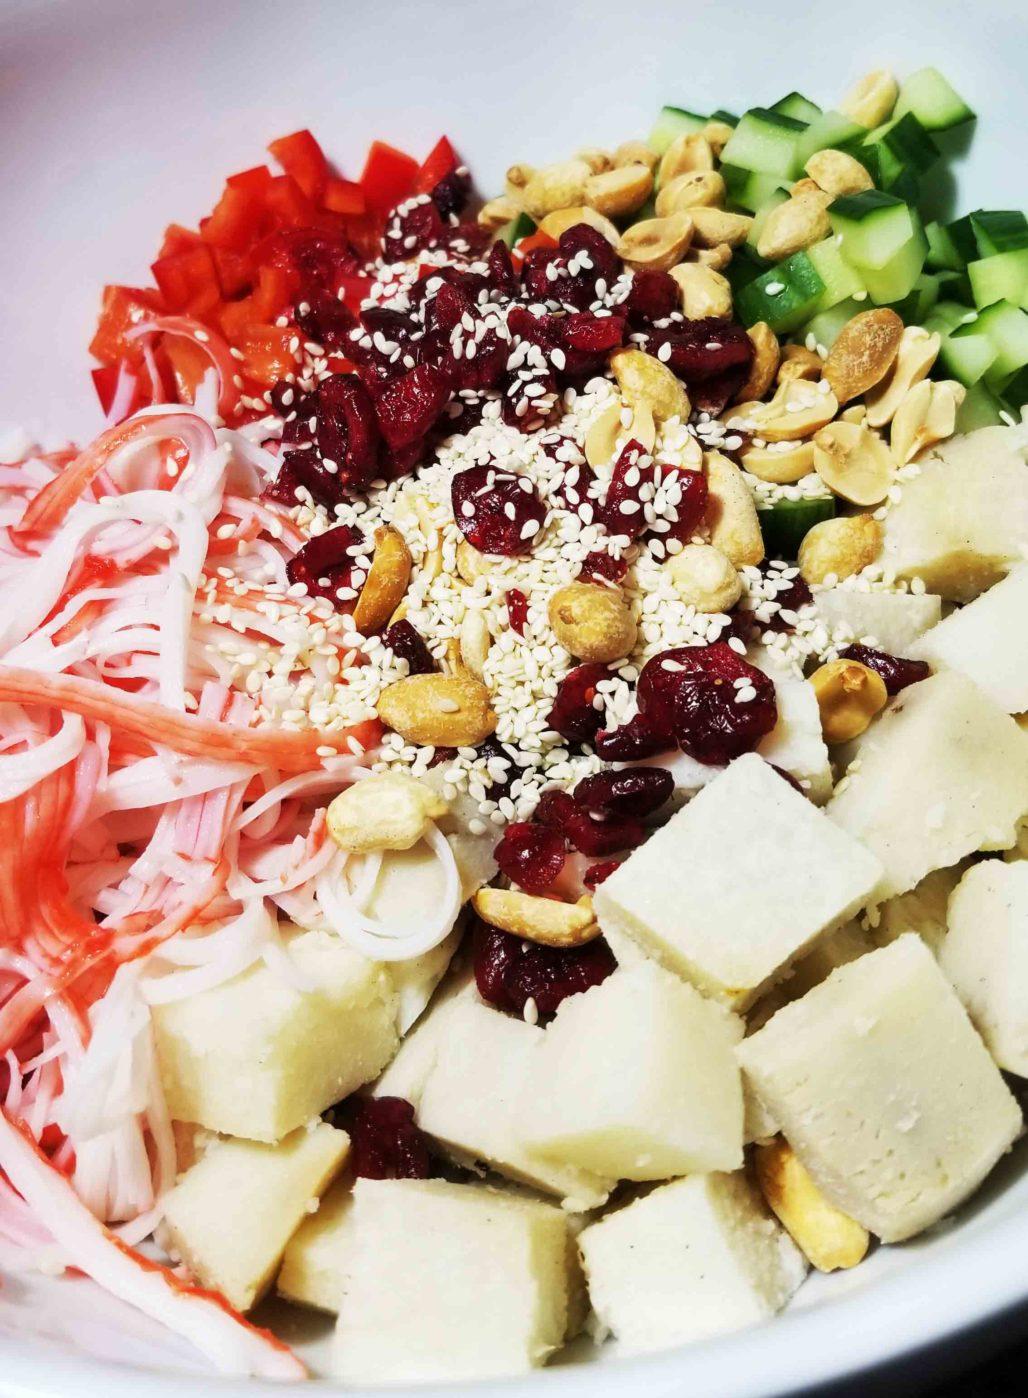 Yam Salad Serving Suggestion